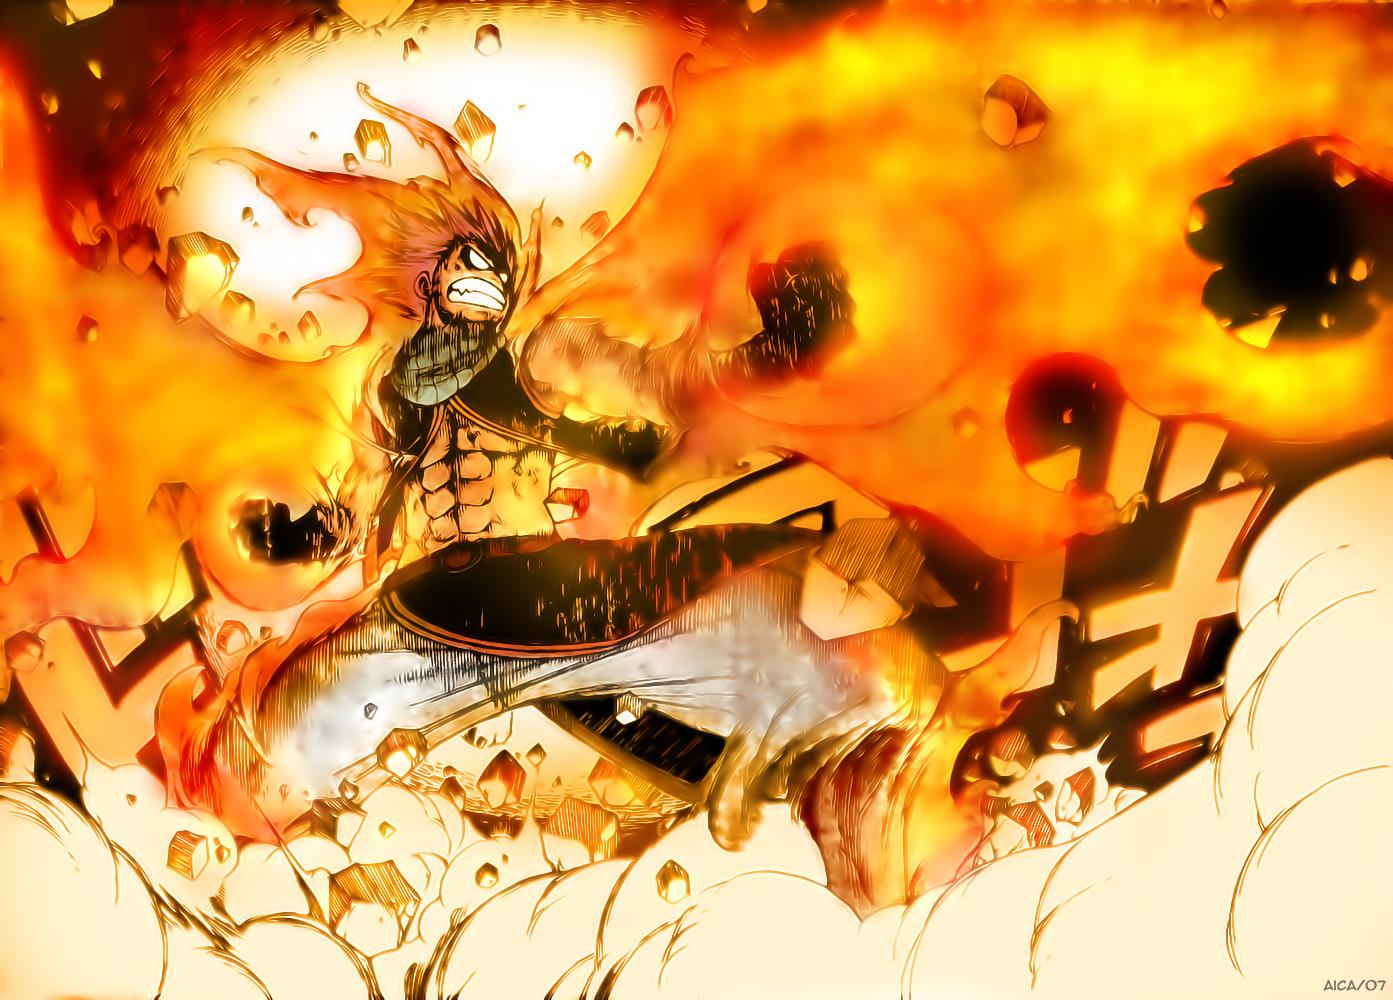 Fairy Tail Natsu Dragneel Wallpaper Wallpaper Full HD Wallpapers 1393x1000